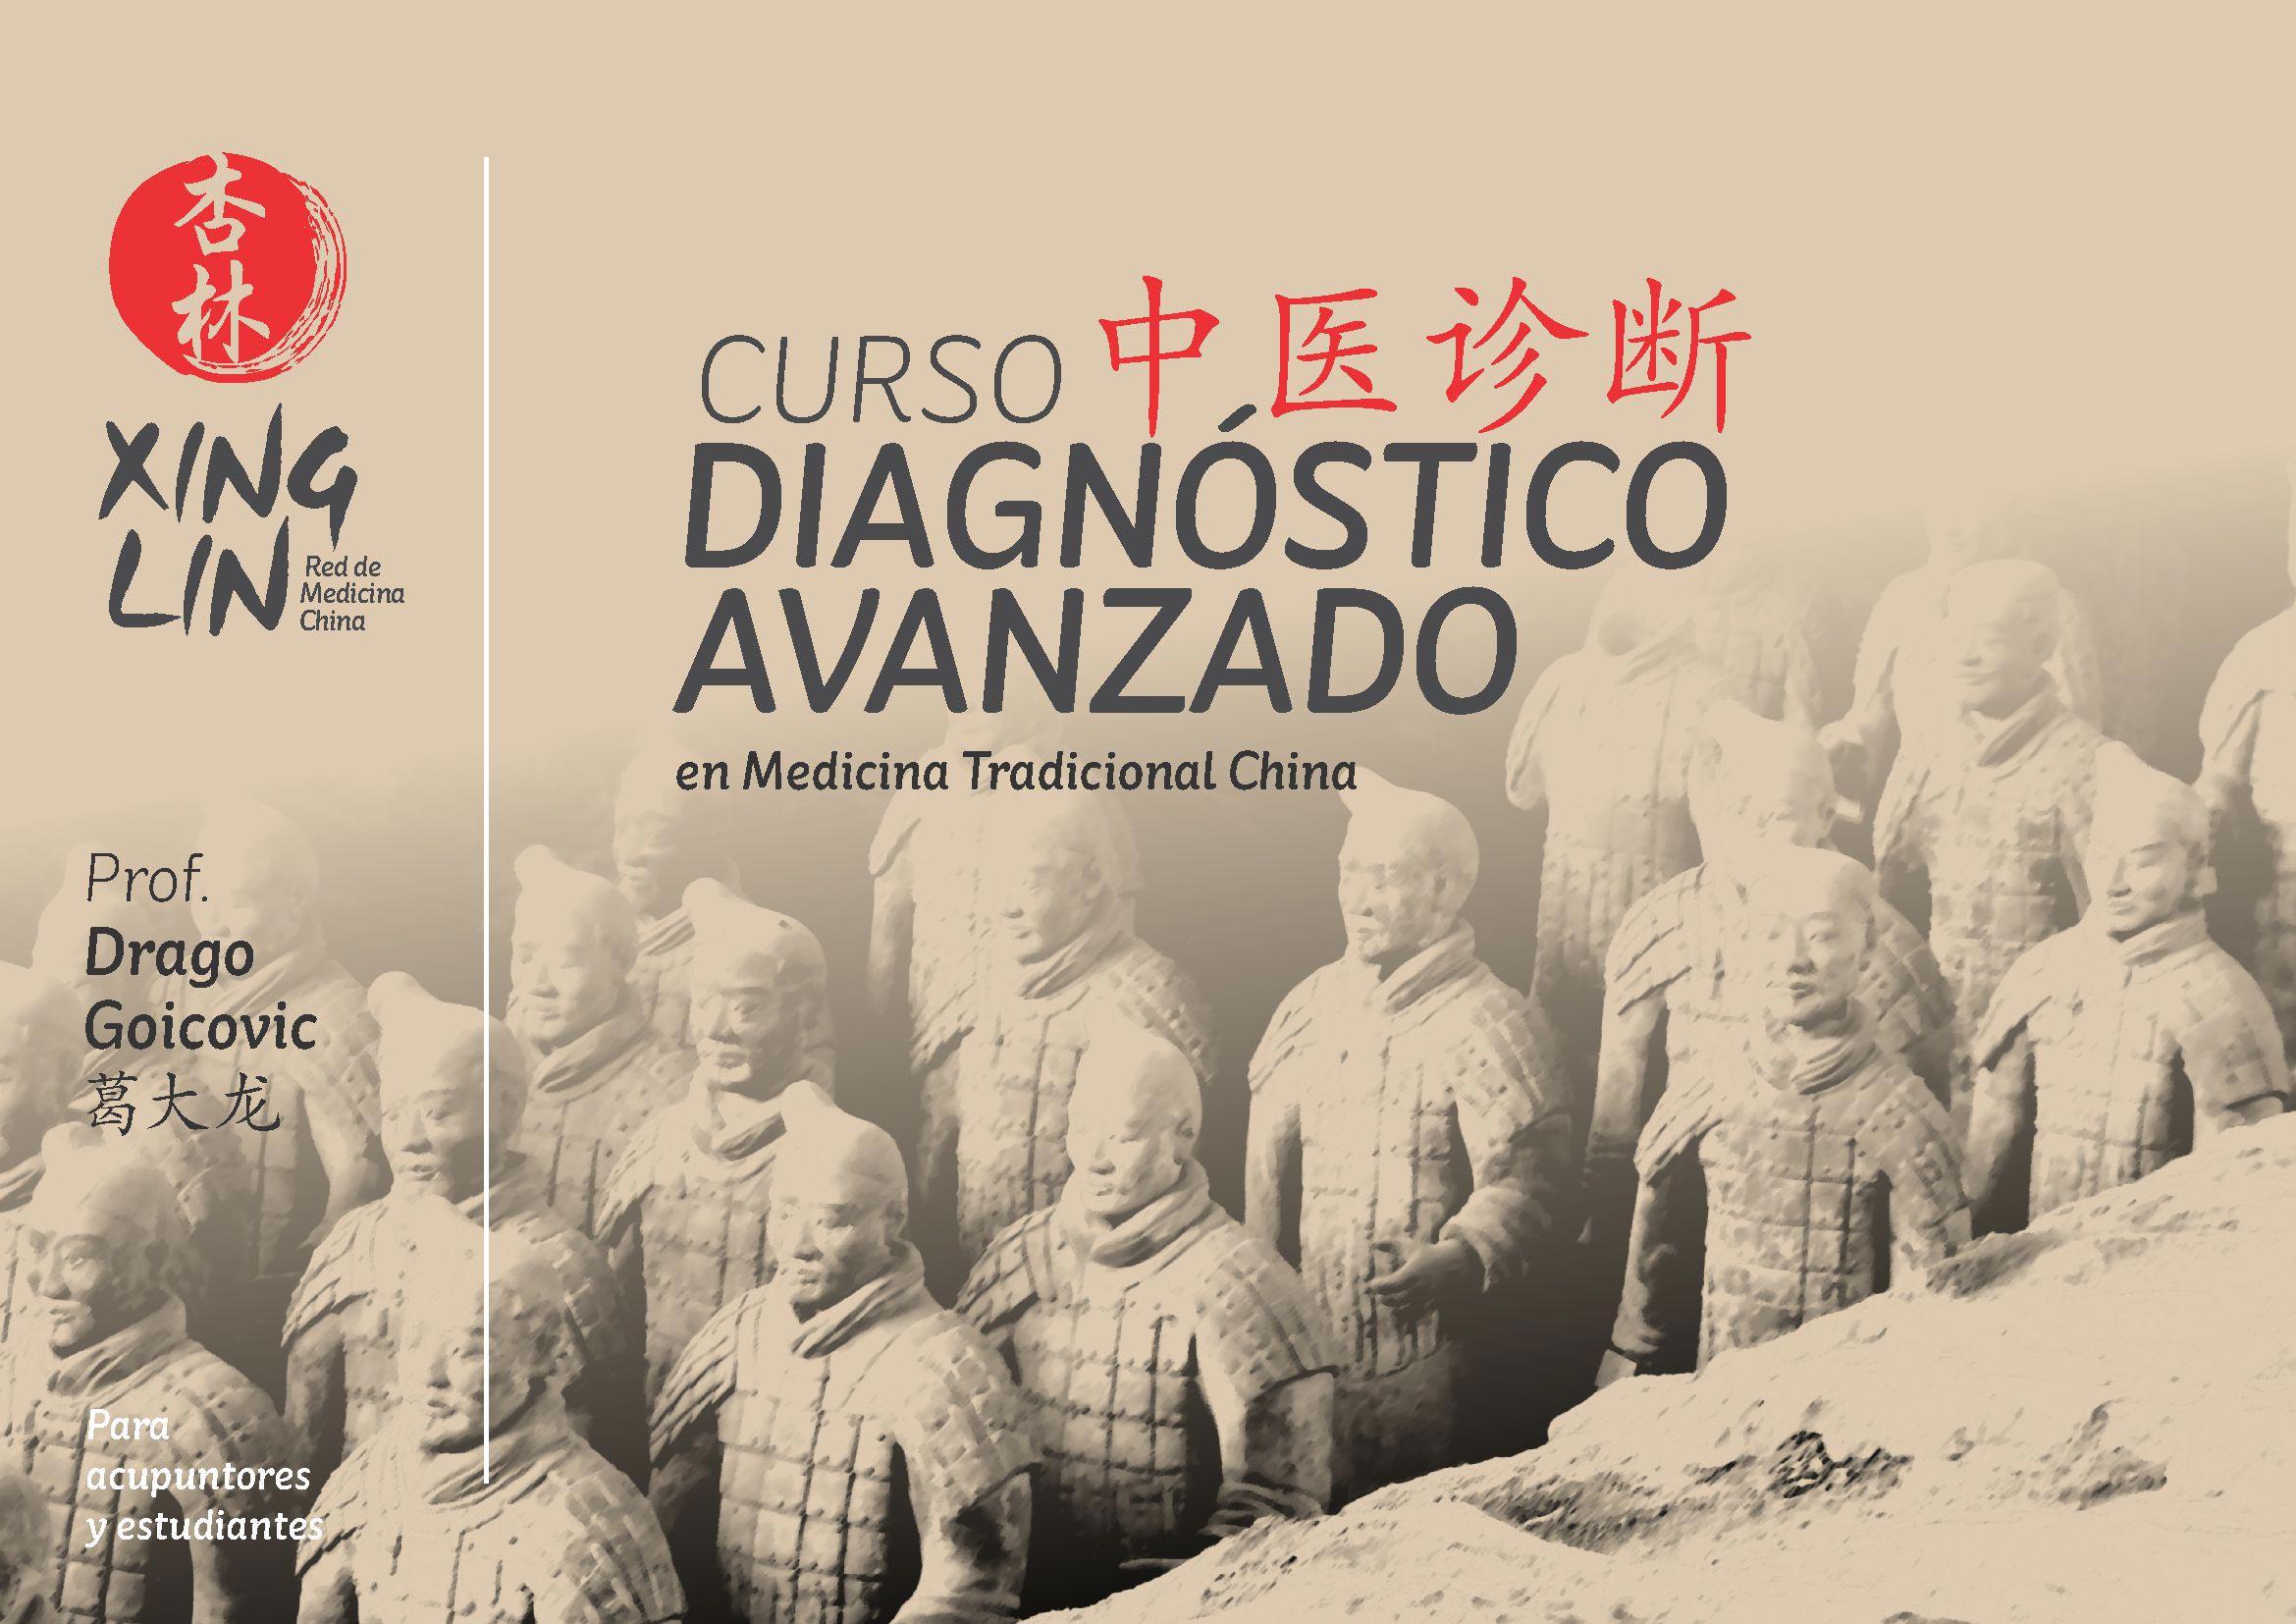 Curso de Diagnóstico Avanzado en Medicina Tradicional China course image